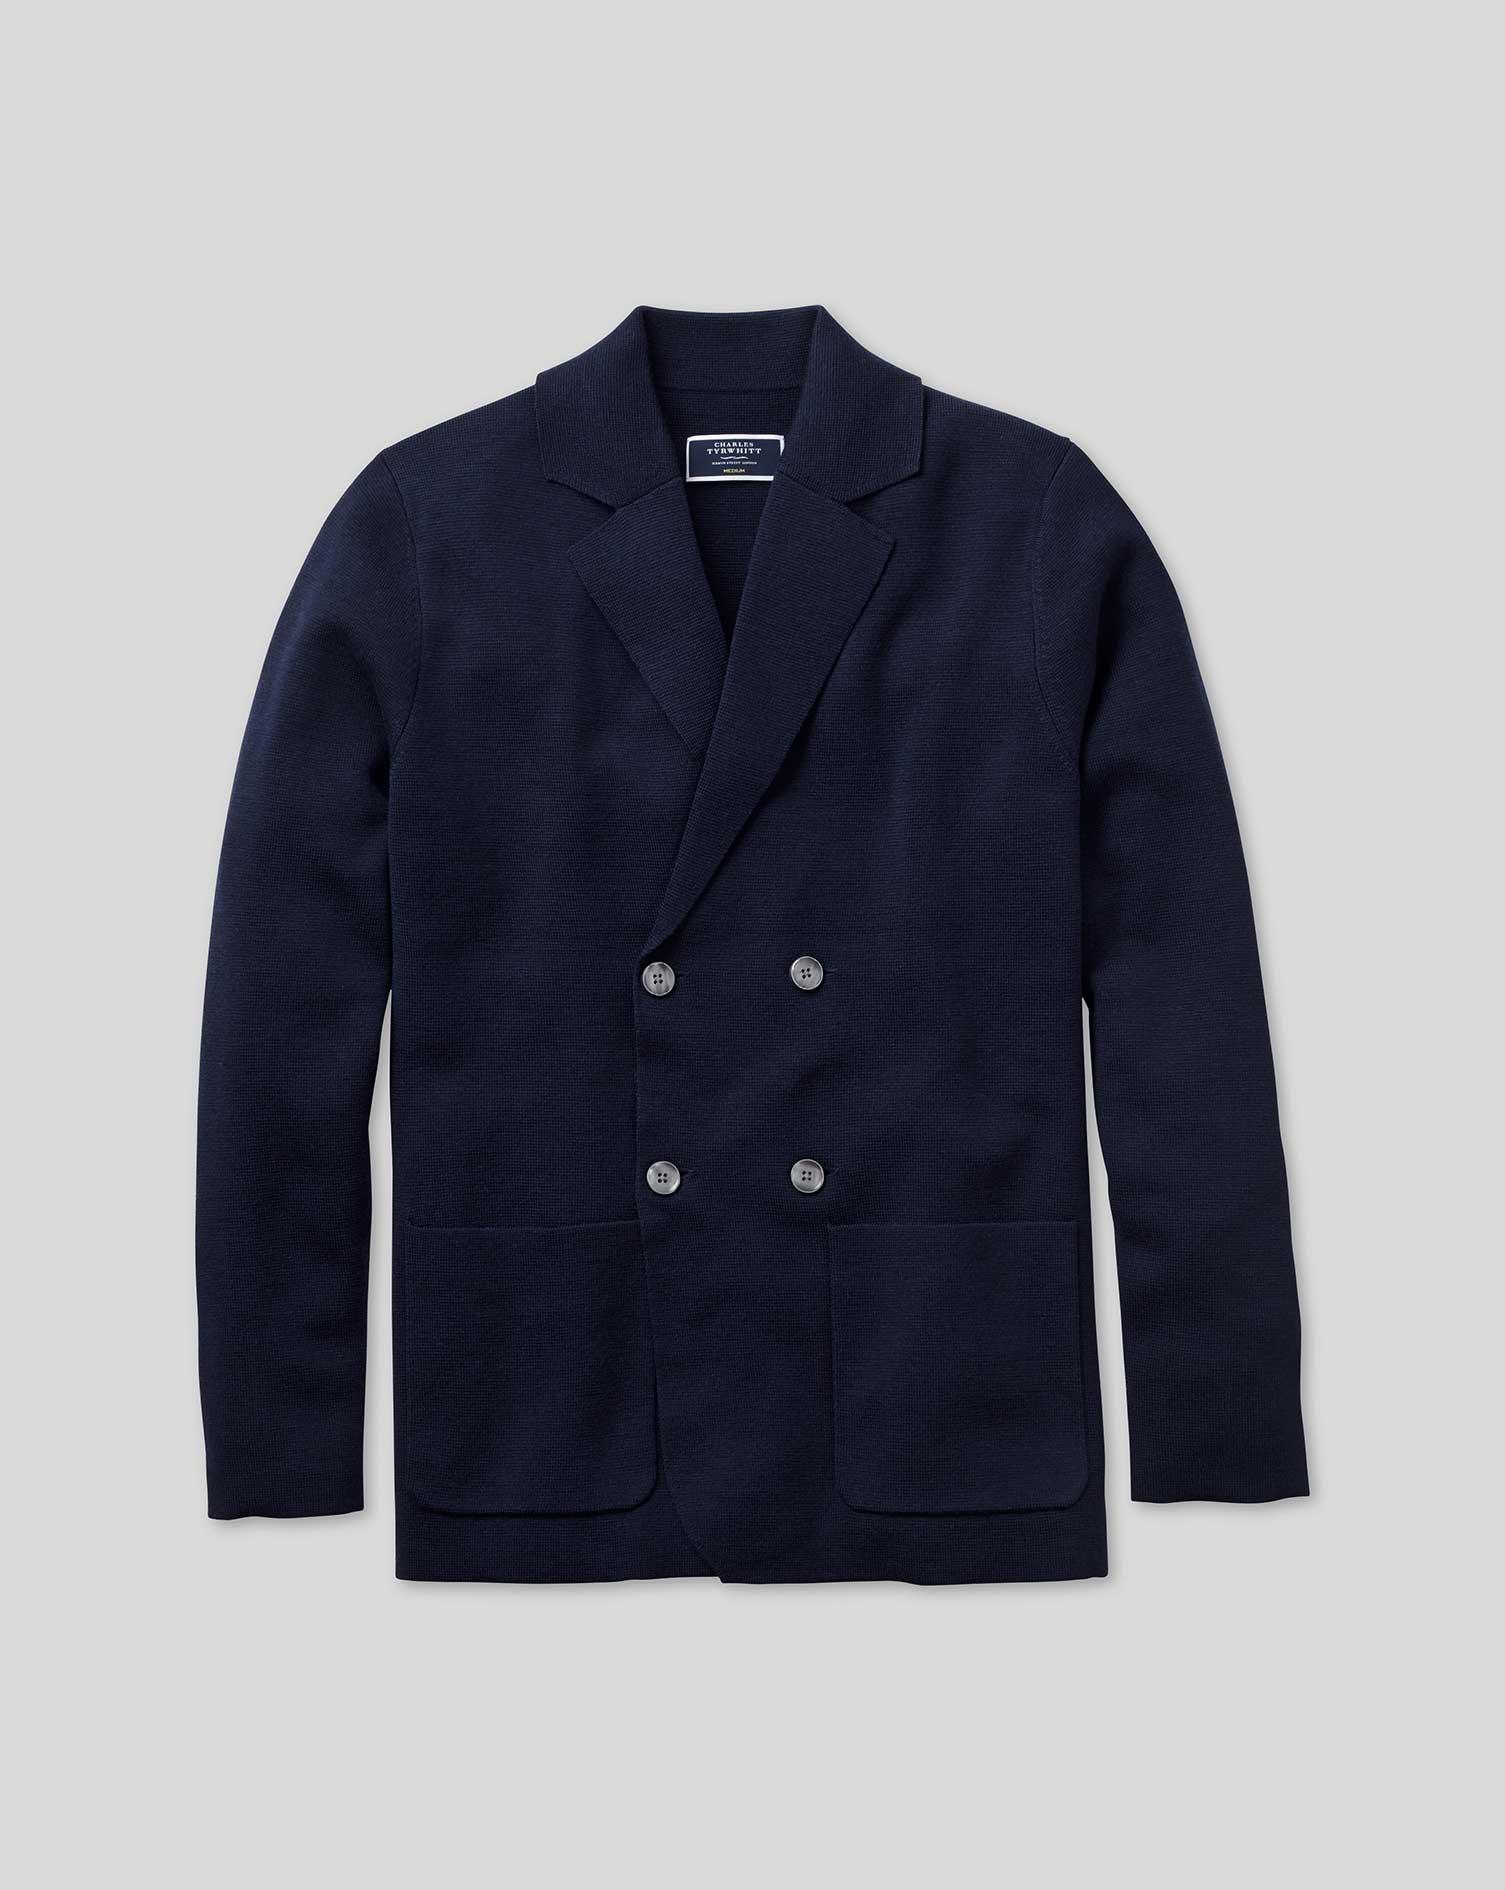 Navy Merino Wool Double Breasted Blazer Size XL by Charles Tyrwhitt